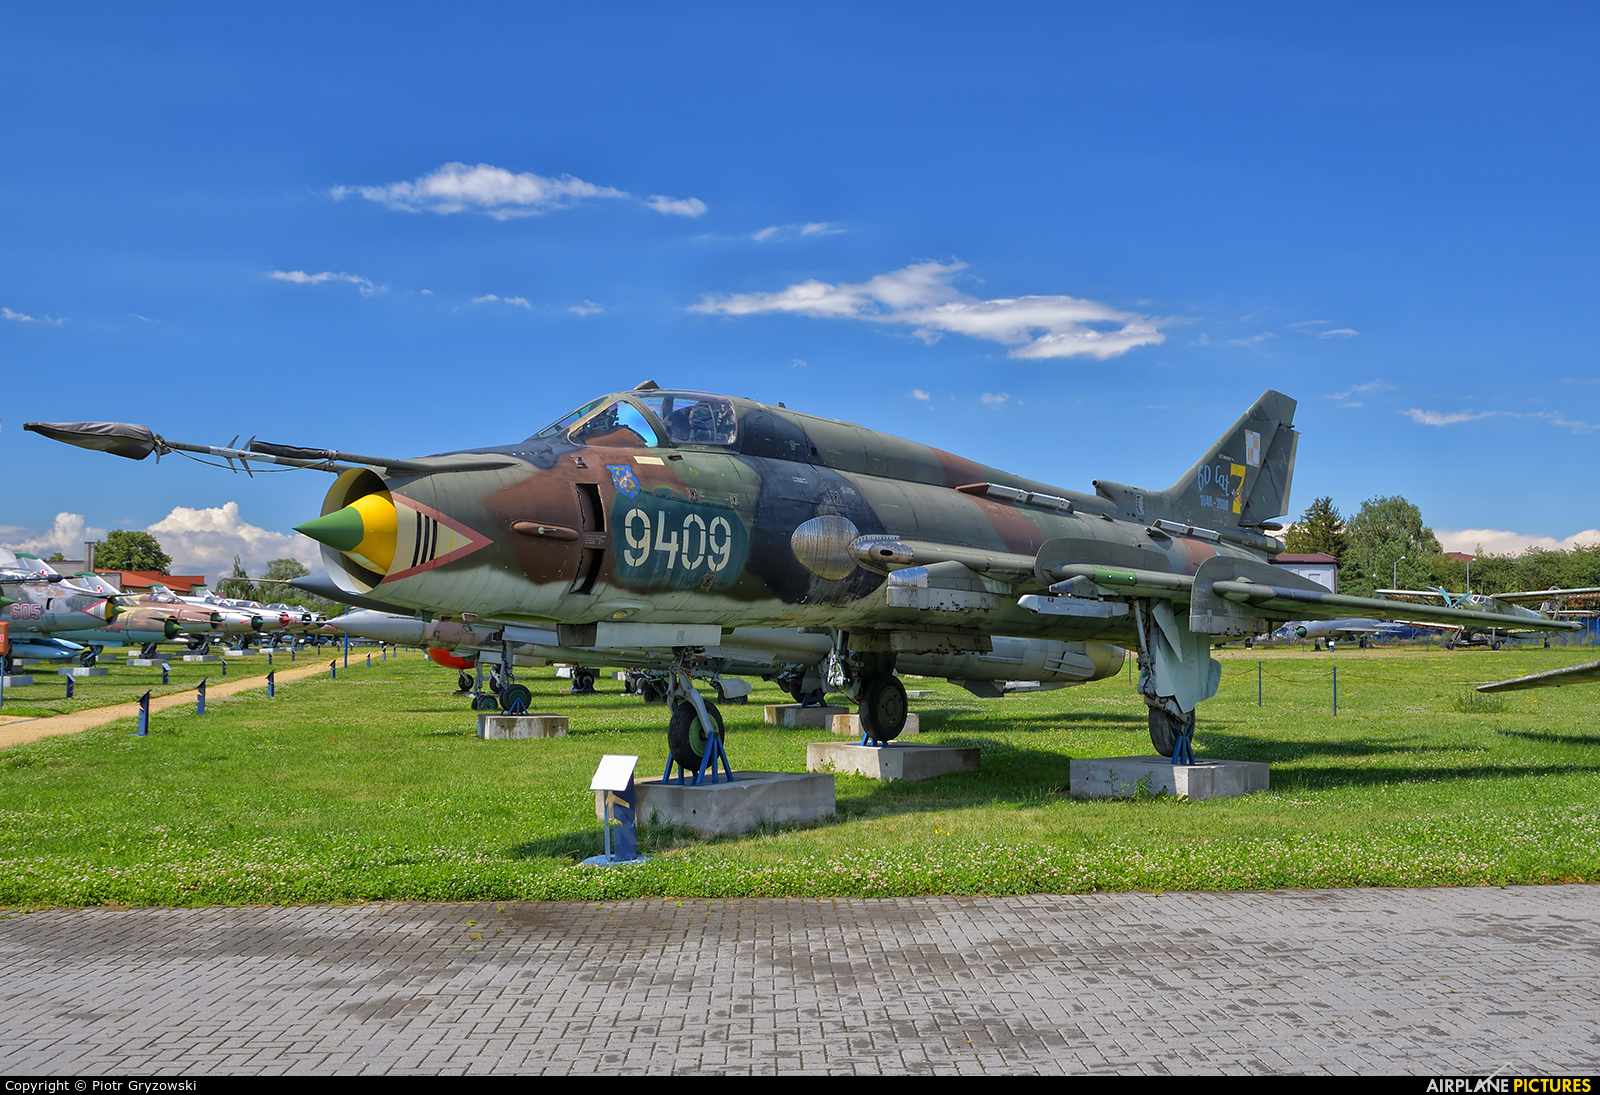 Poland - Air Force 9409 aircraft at Dęblin - Museum of Polish Air Force